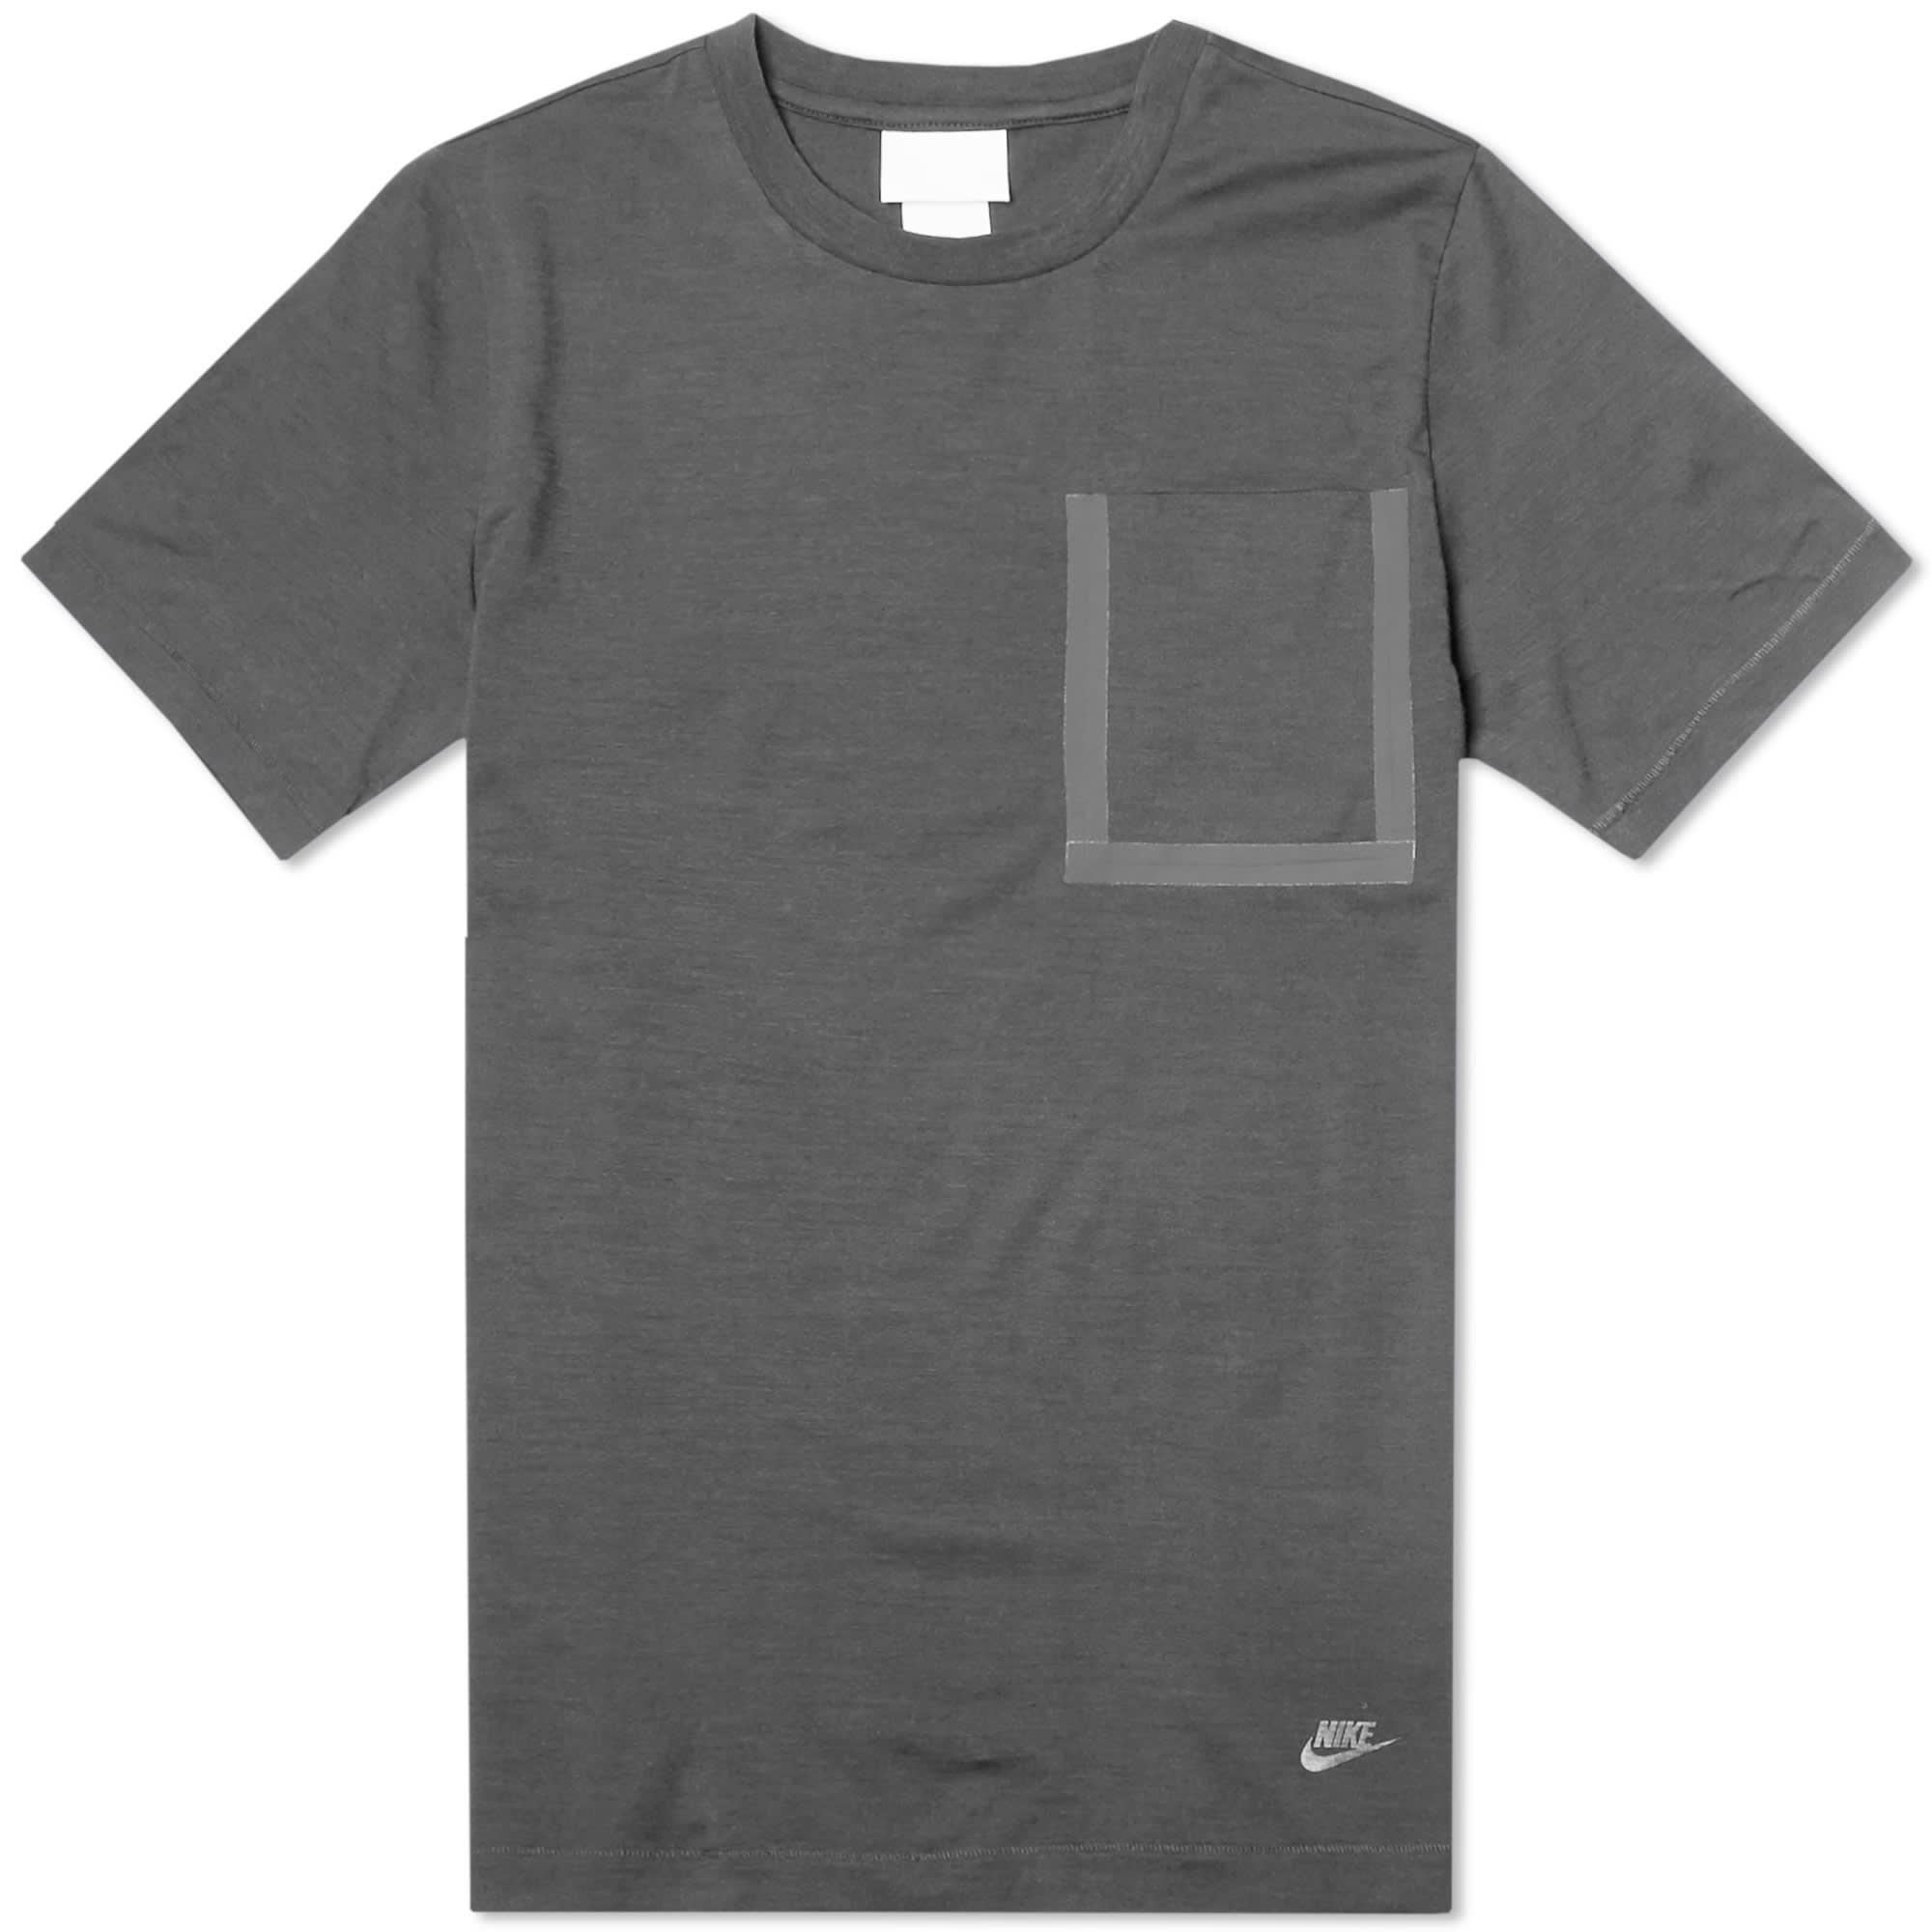 Nike White Label Pocket Tee